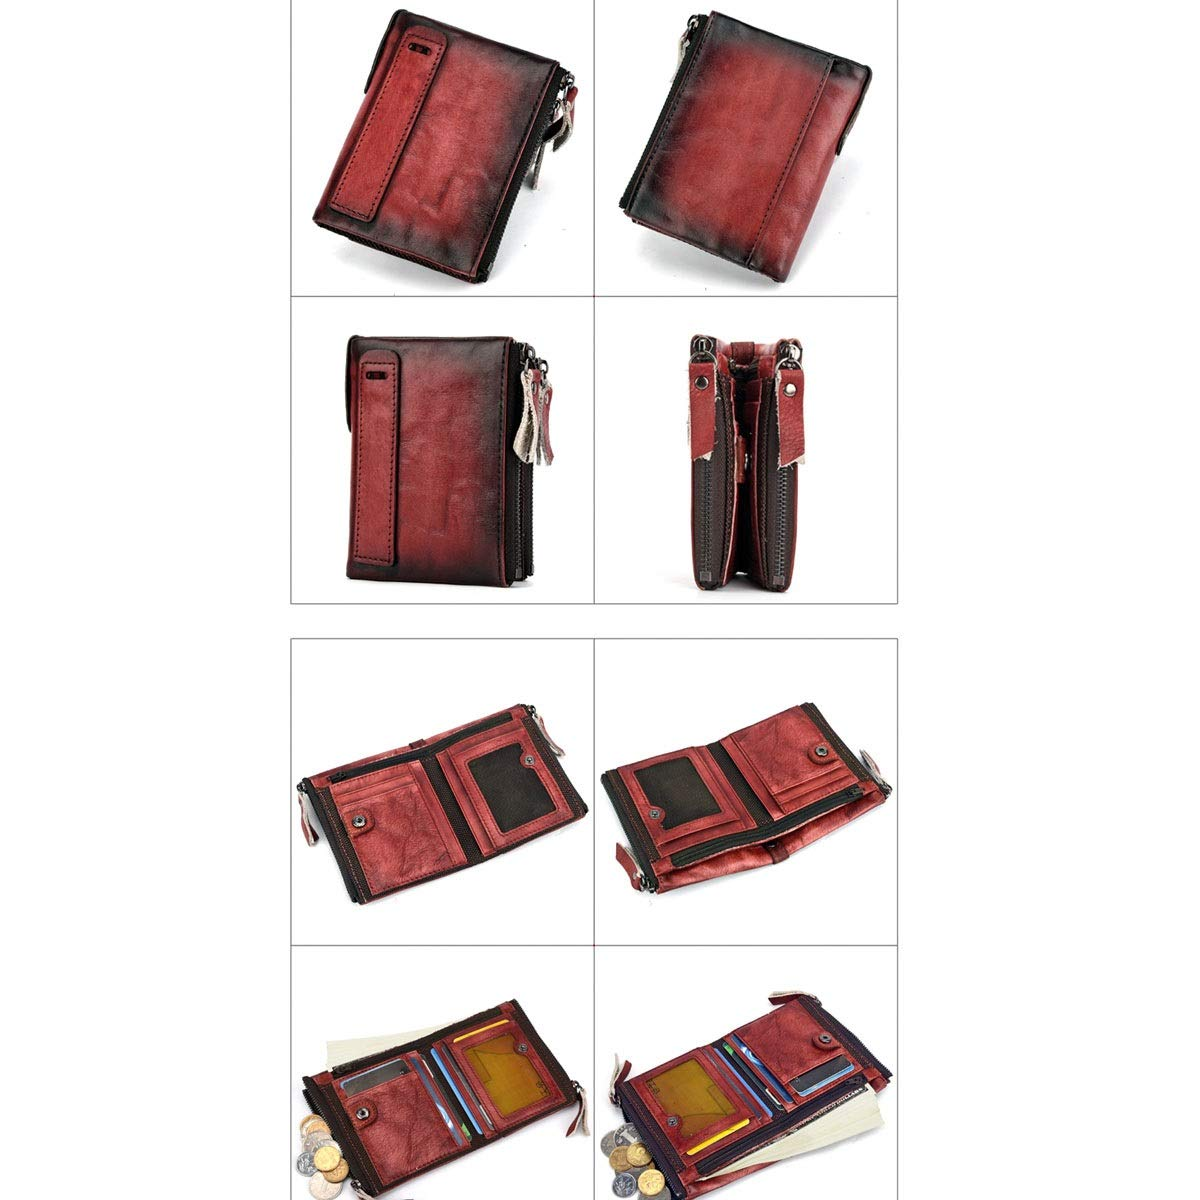 Kalmar Wallet for Man Cowhide Short Retro Multi-Layer Mens Size 12 9 3cm Stealth Mode Blocking Leather Wallet Color : Red, Size : L